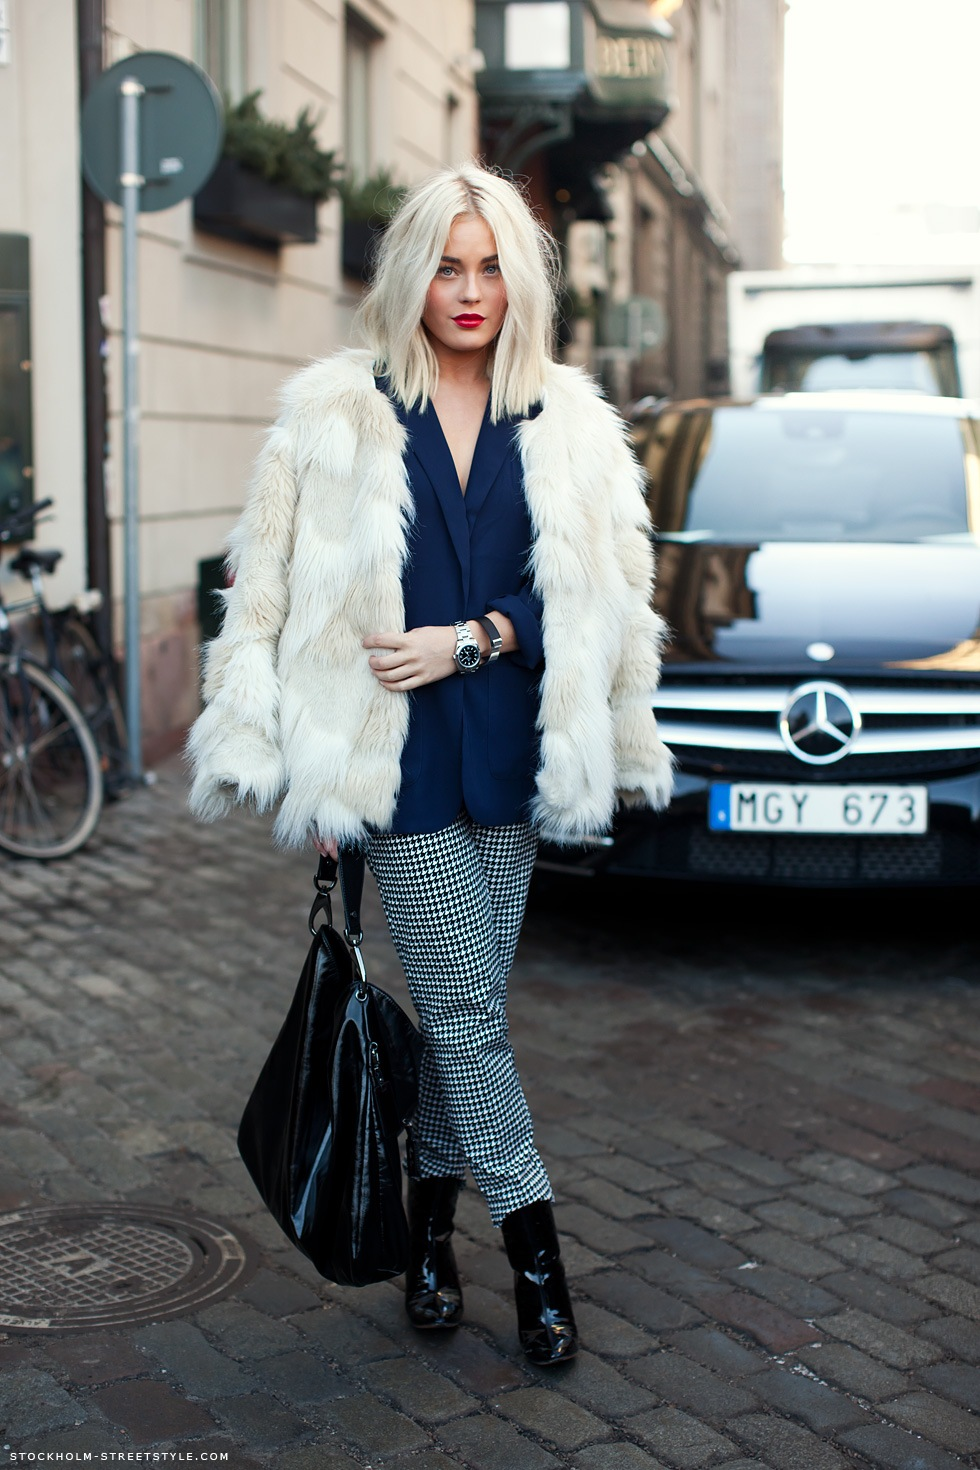 Stockholm Streetstyle: Printed Pants